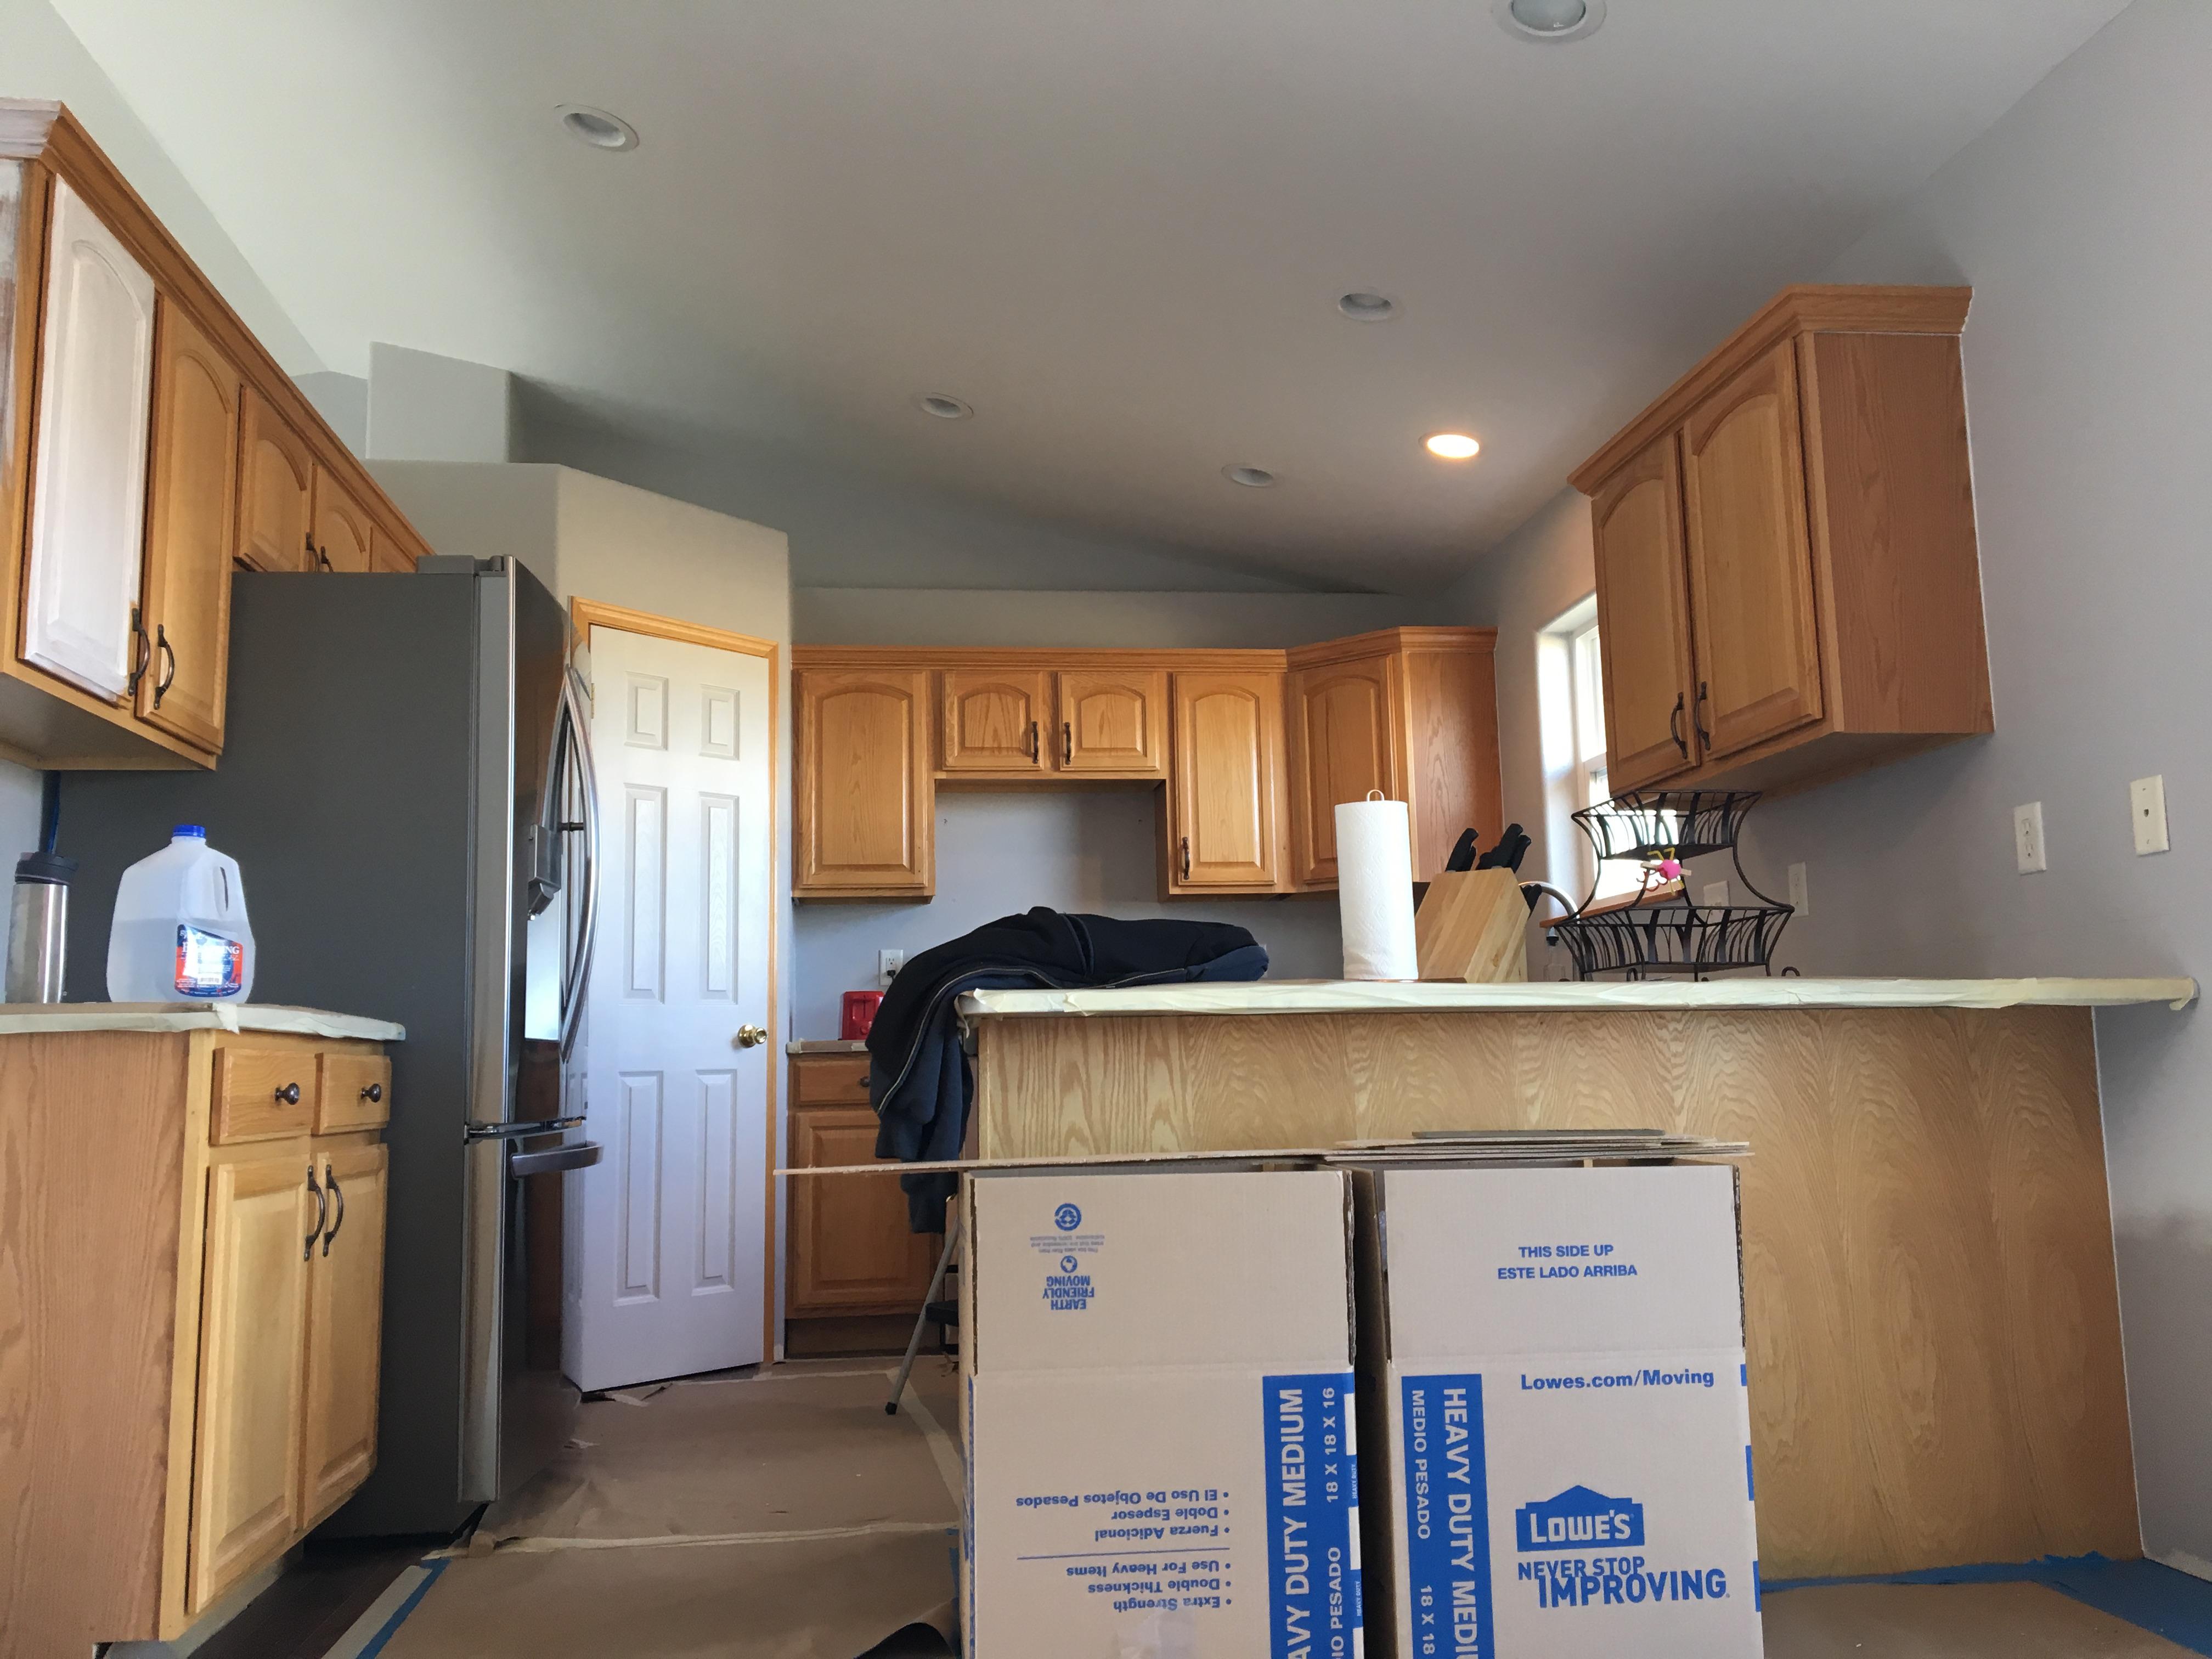 Cabinet Refinishing and Wood Repair in Helena, Montana